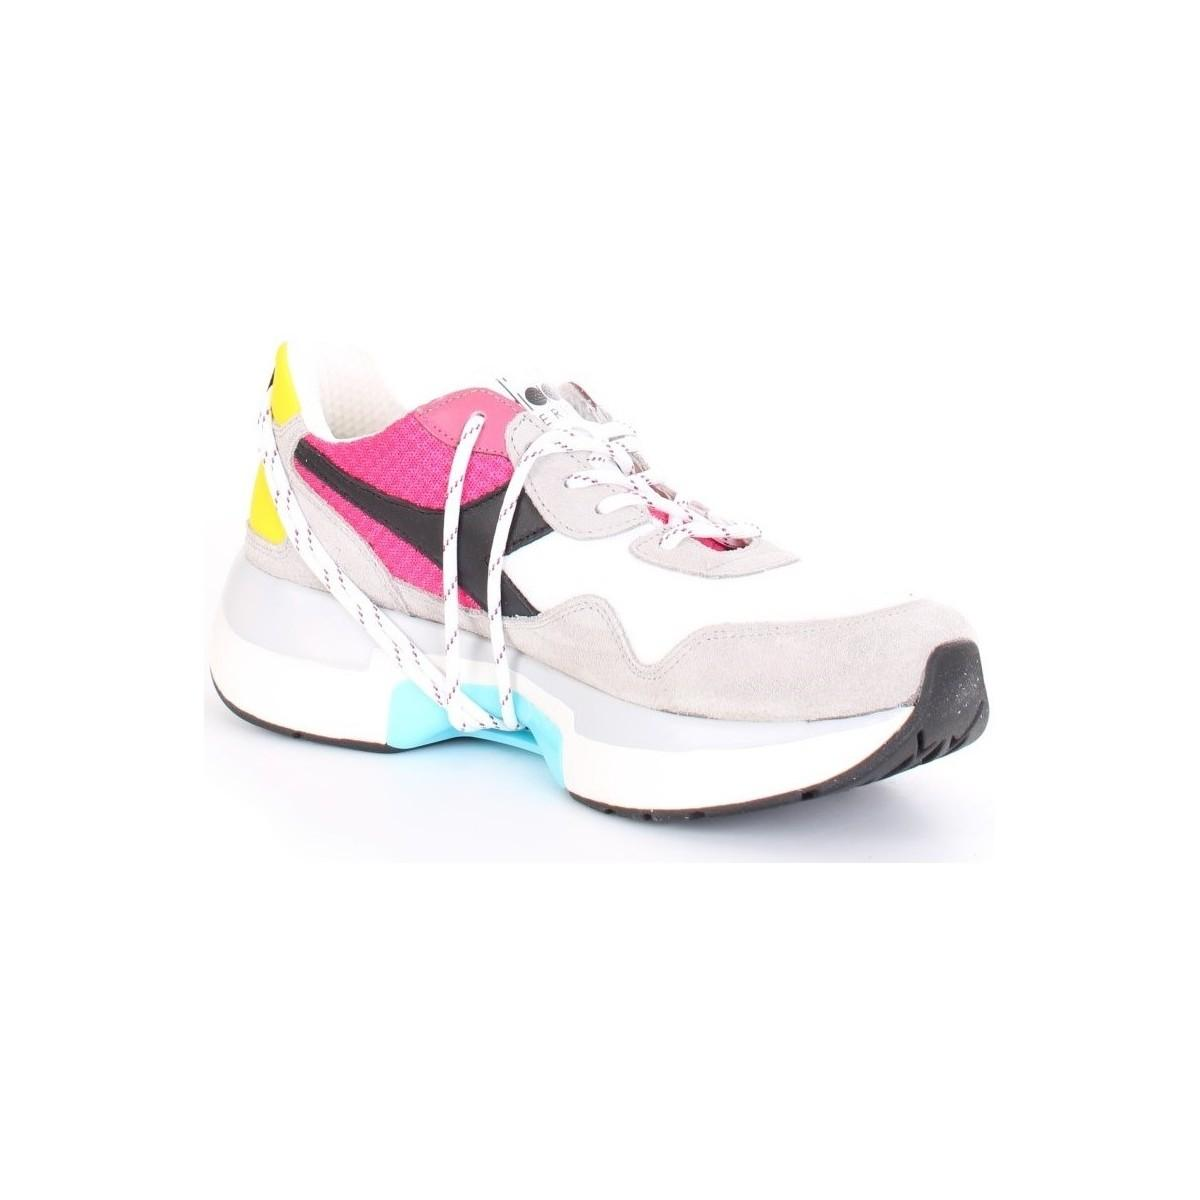 201.174817 Chaussures Diadora oMEp